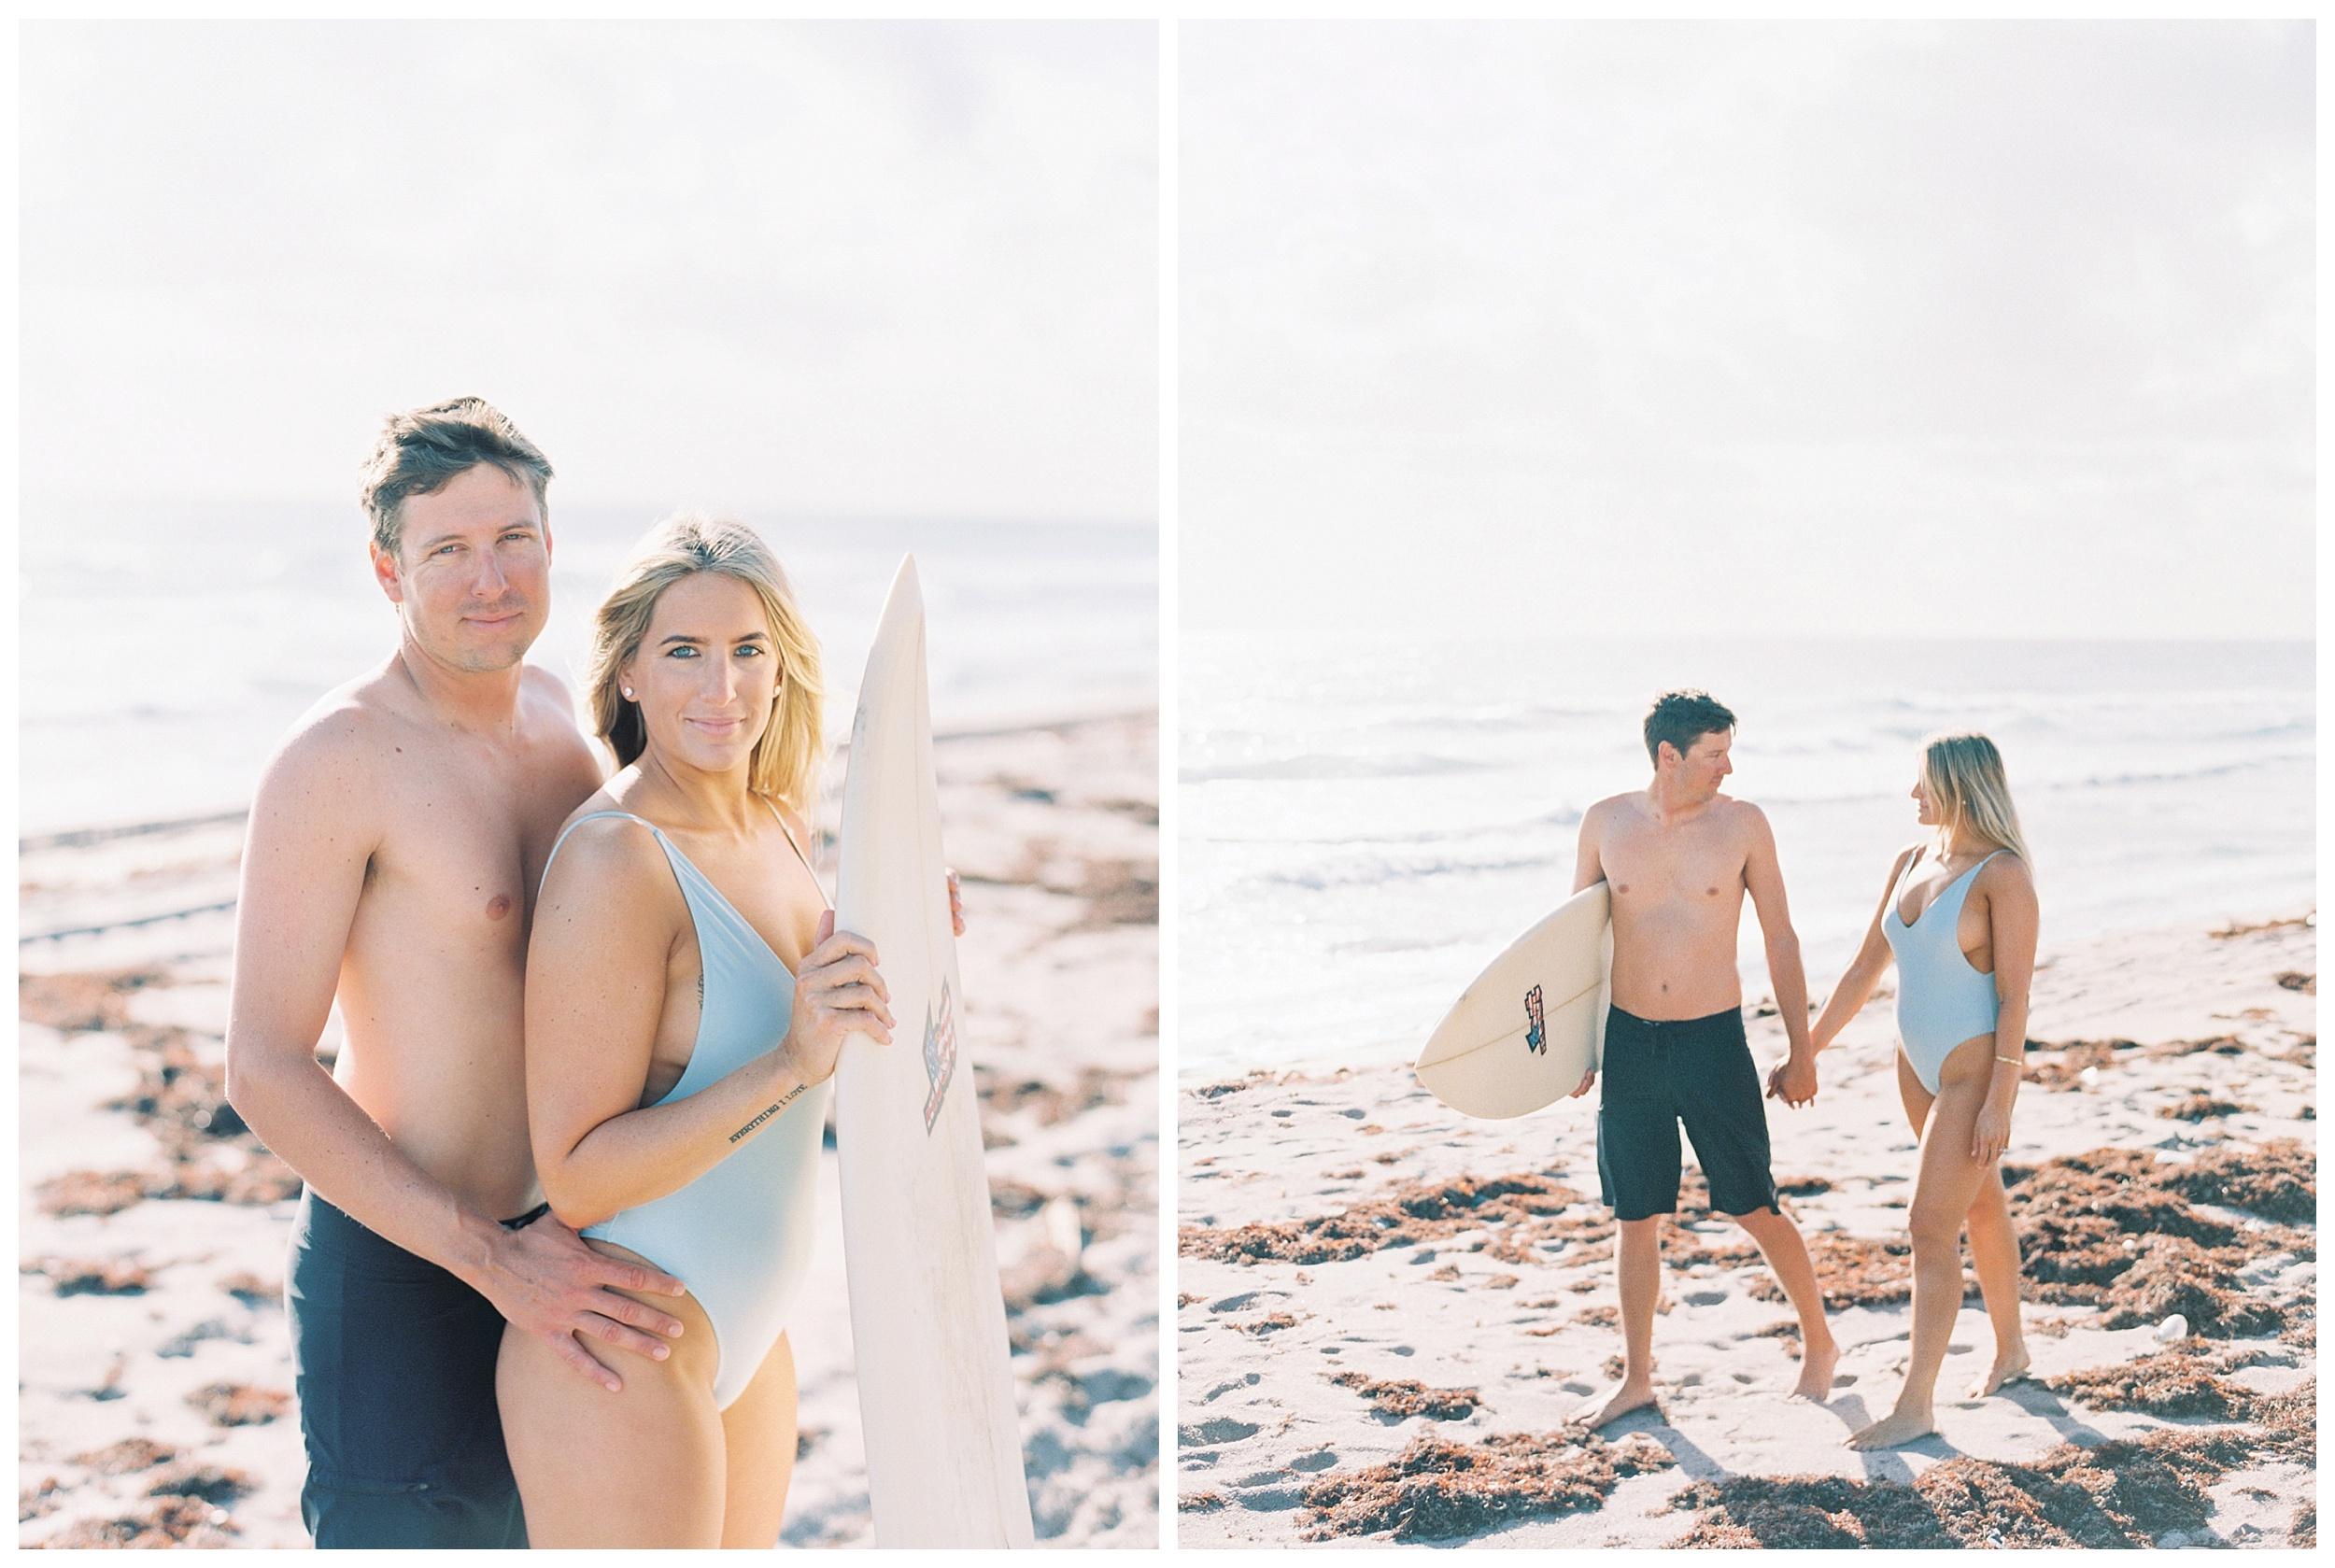 Surfboard Engagement Florida Wedding Photographer Kir Tuben_0002.jpg